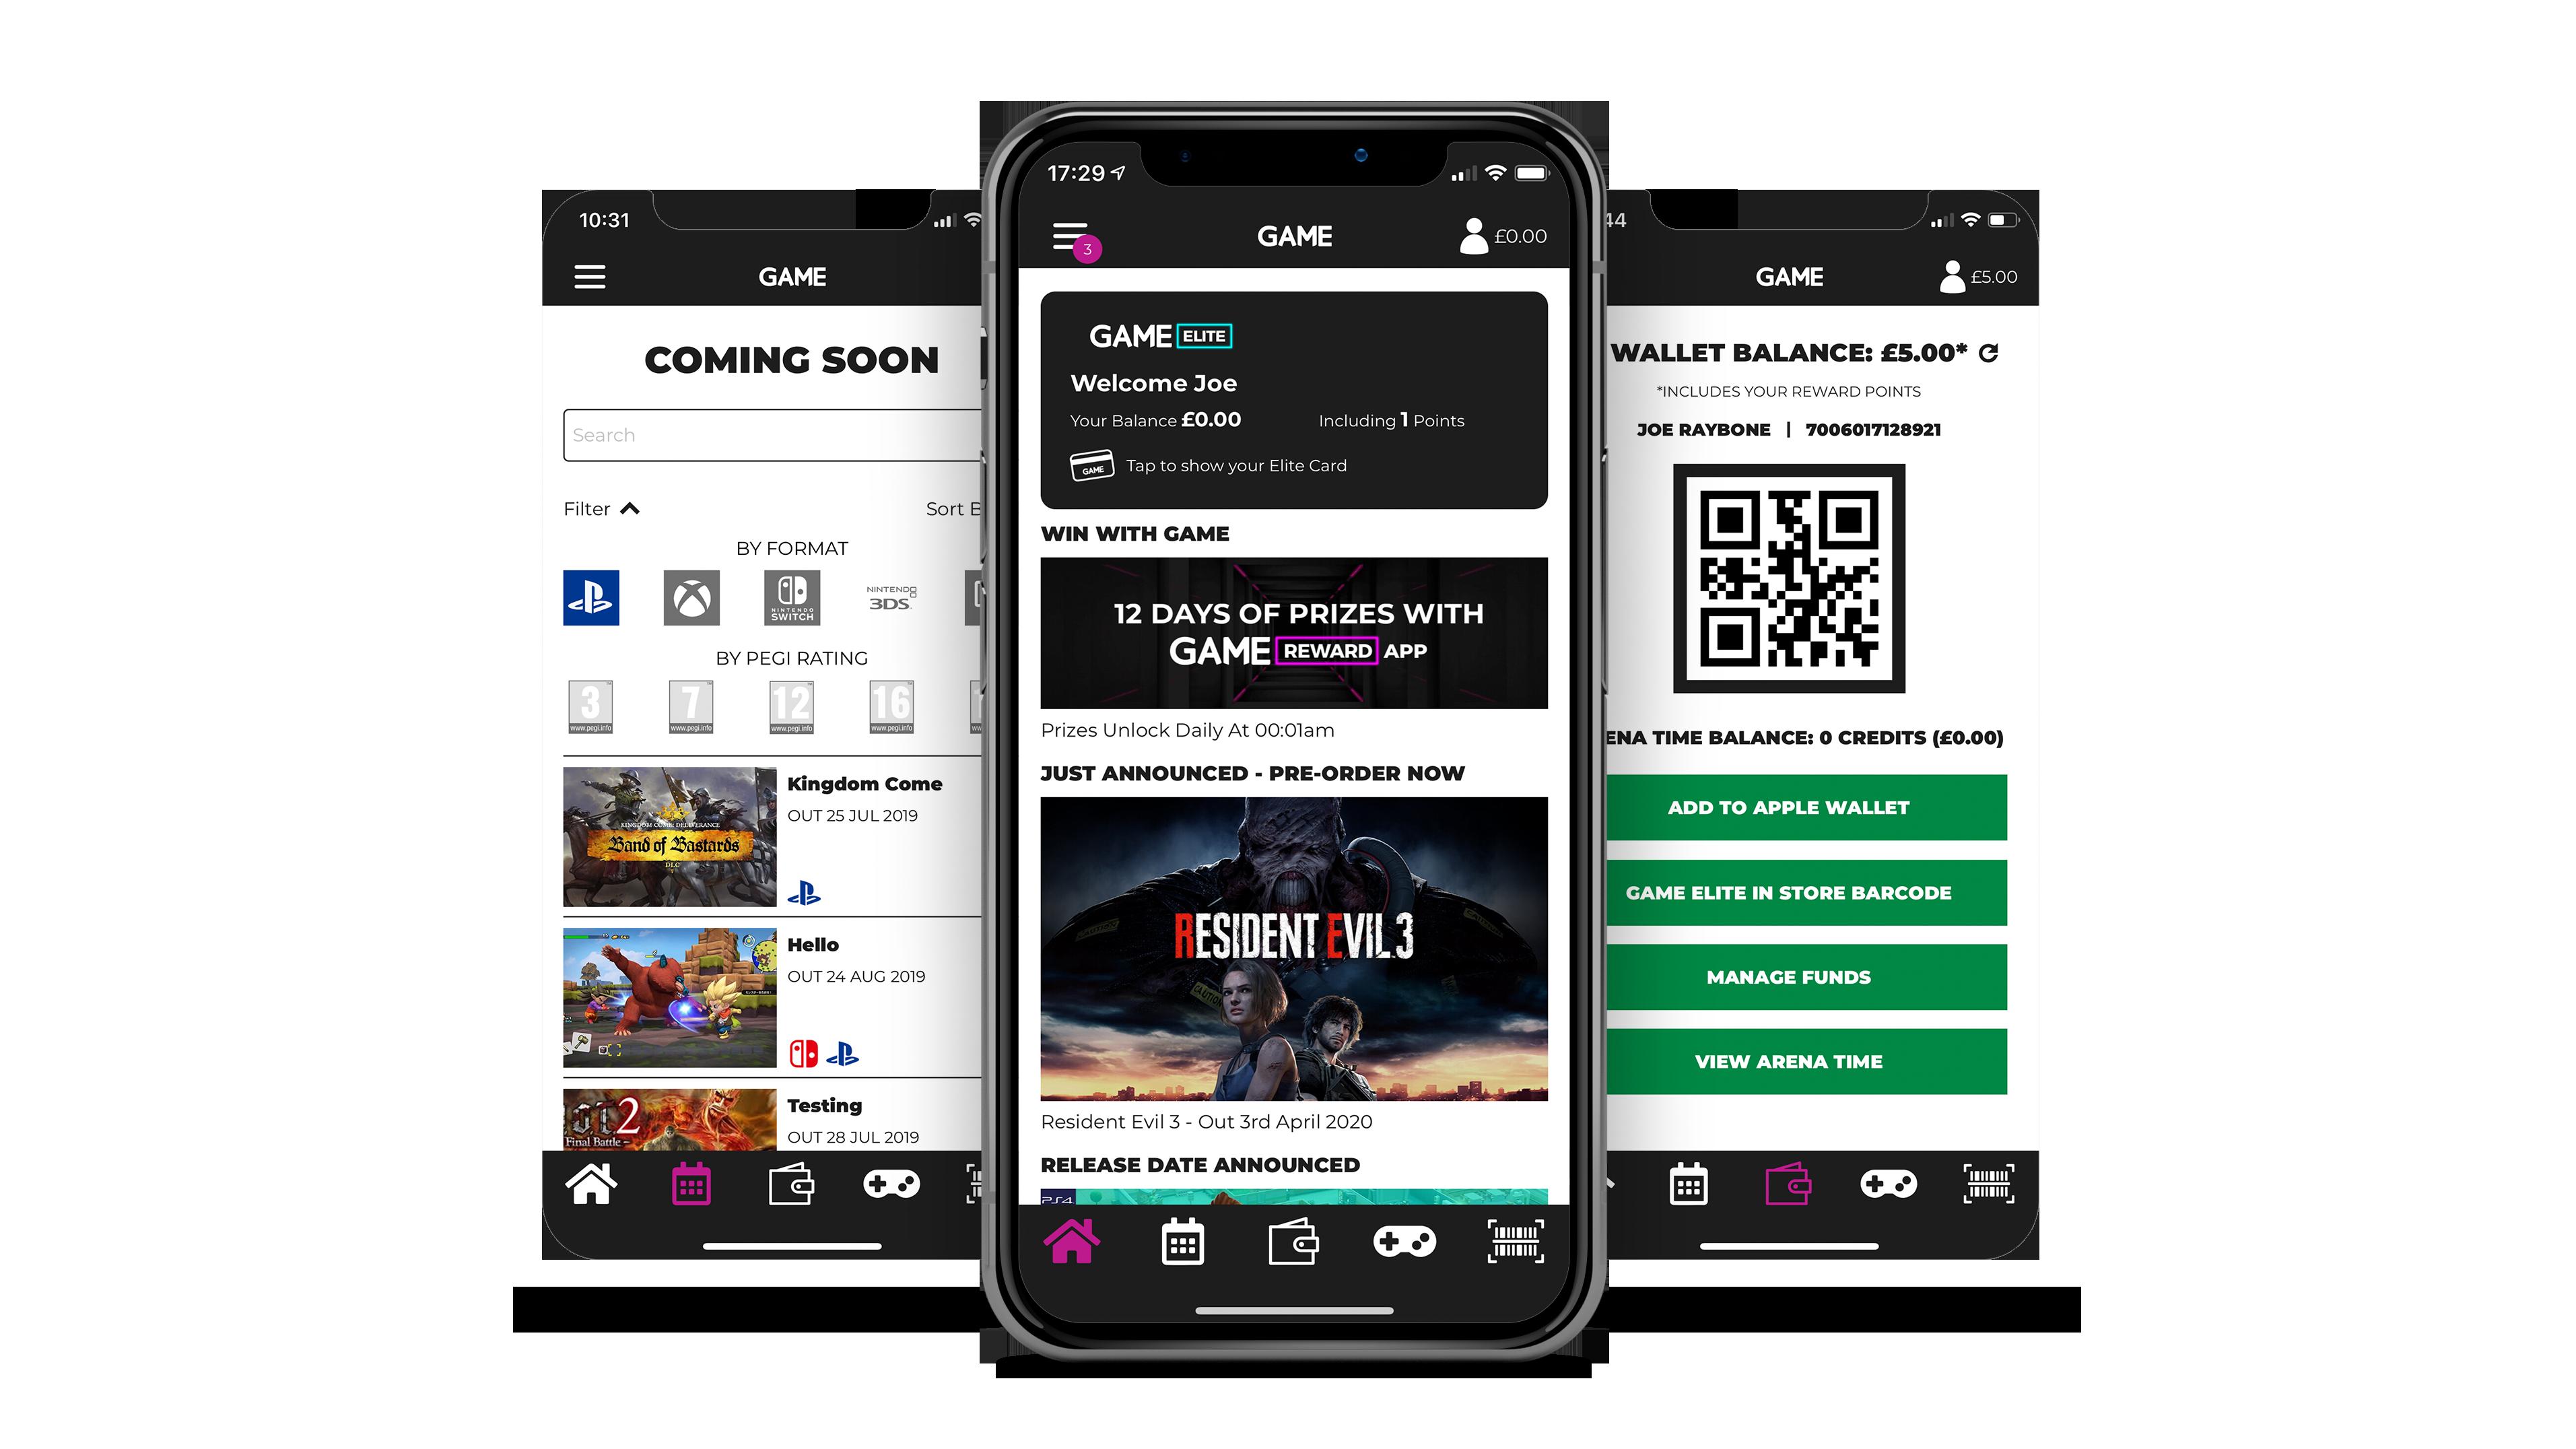 GAME Reward App